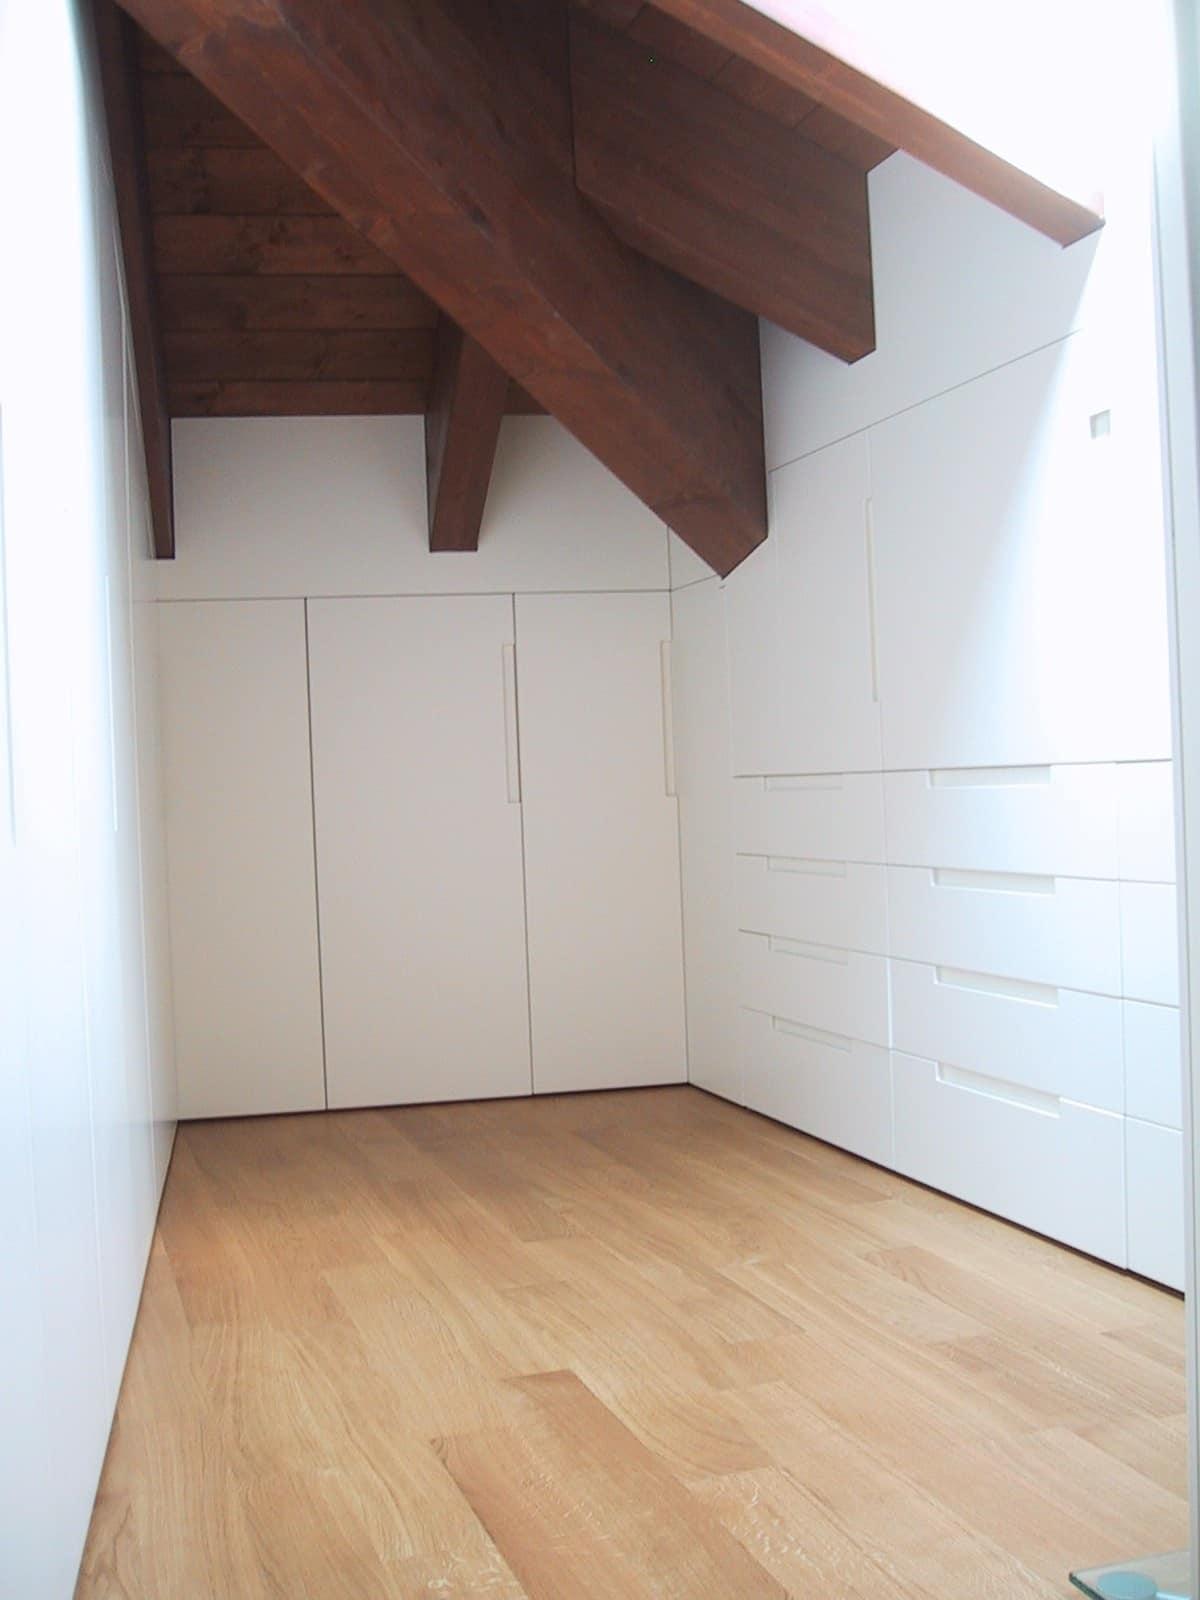 Armadiature Per Esterni armadio in legno laccato bianco, per mansarda | idfdesign